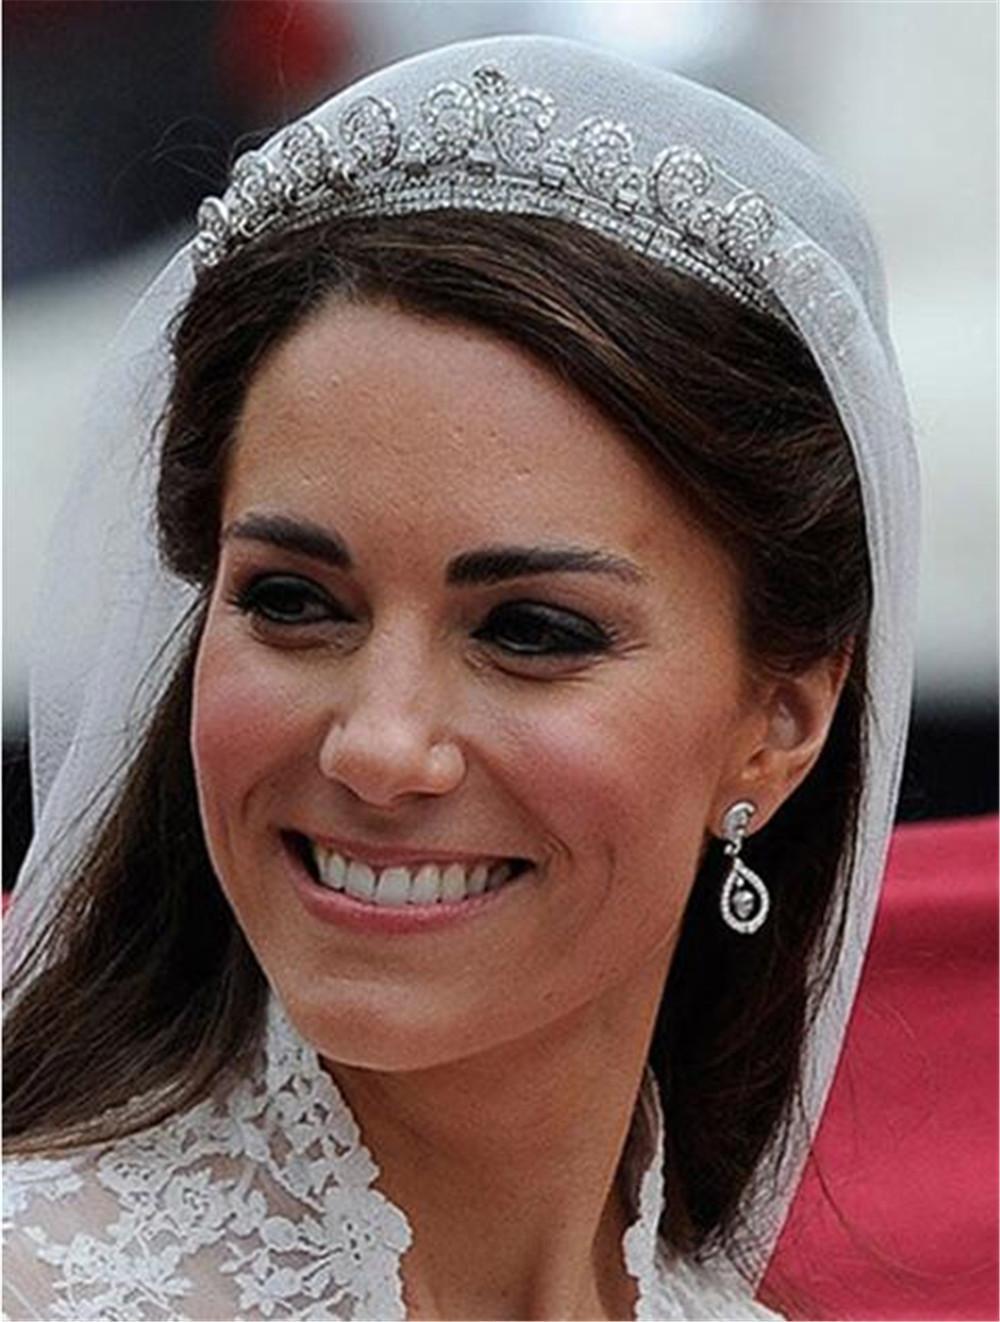 Noiva Vintage Coroa Kate Princesa Royal Coroas Mulheres Tiaras Headdress Nupcial Princesa Headdress Headpieces Acessórios